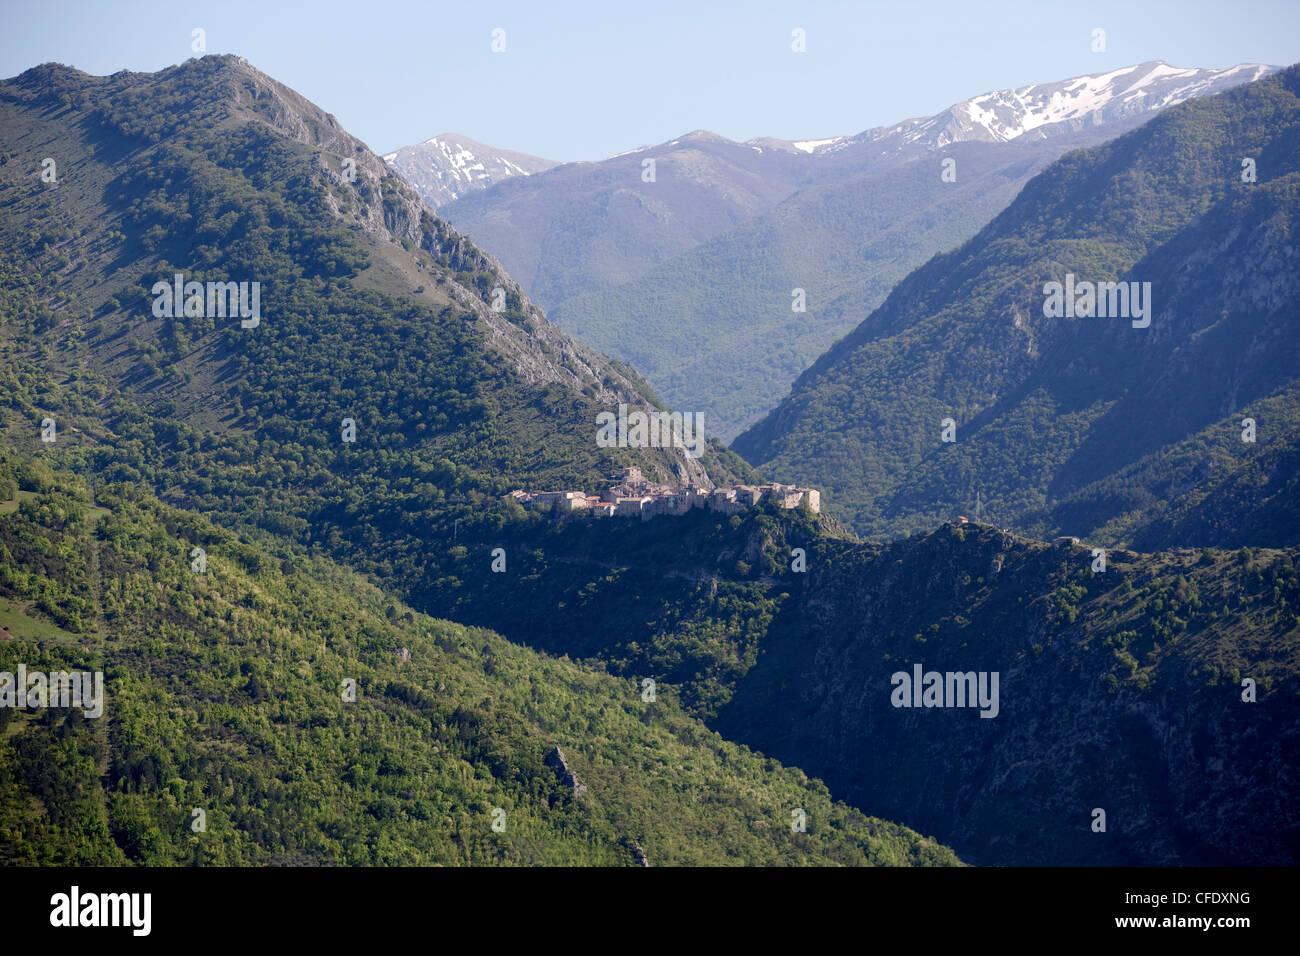 View of Castrovalva the Abruzzi village depicted by Escher, Abruzzi, Italy, Europe - Stock Image